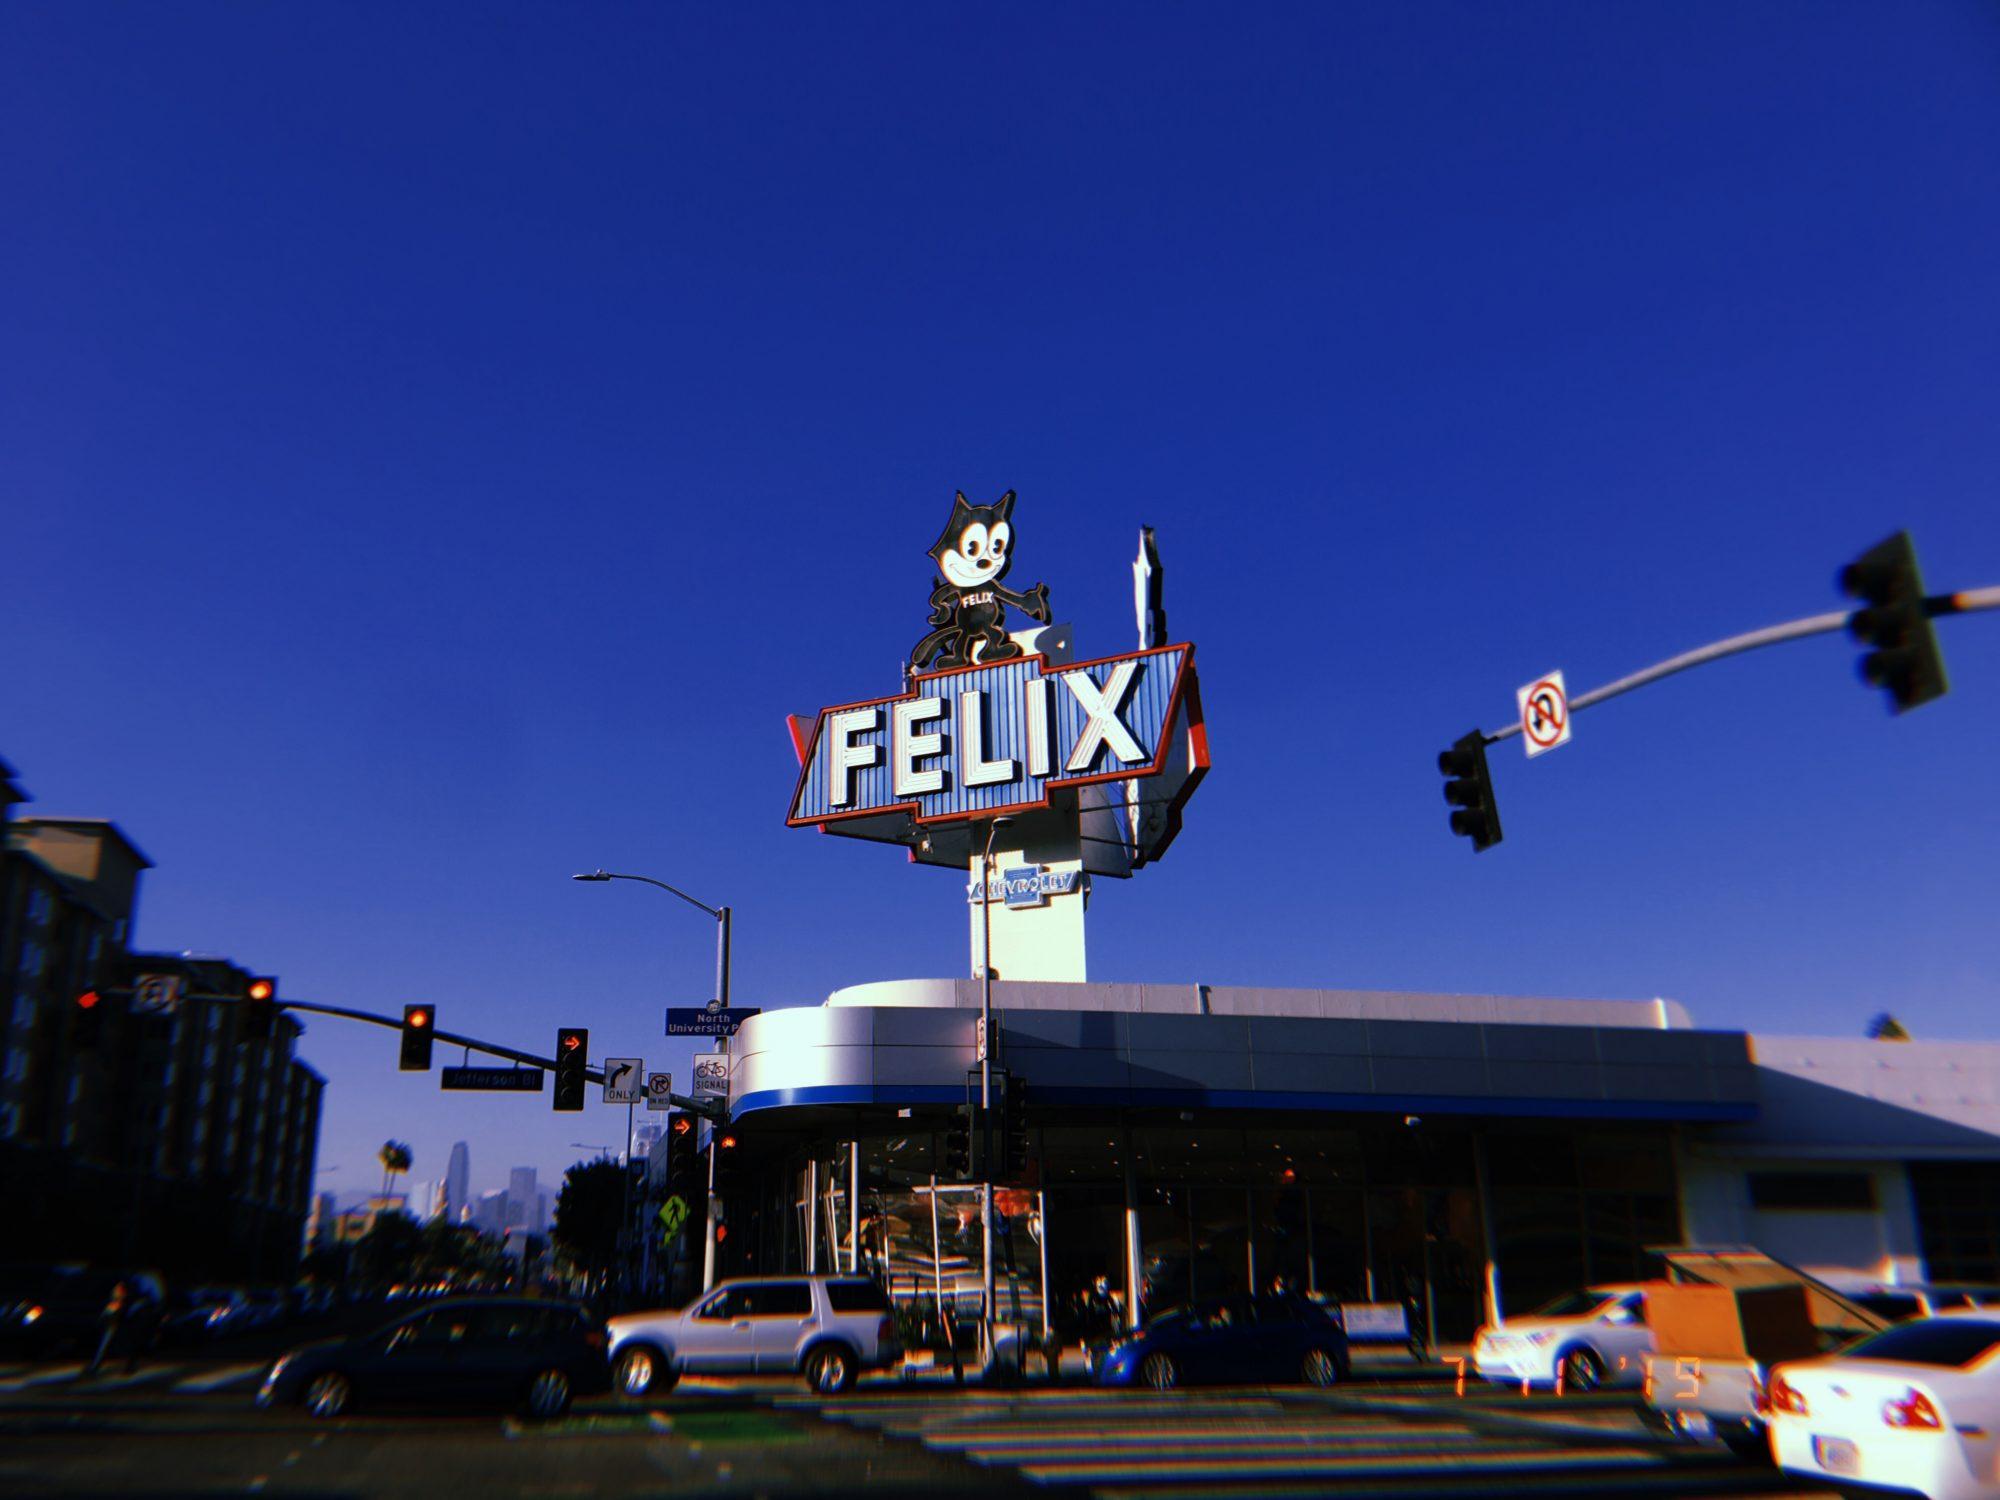 Los Angeles, 2019. Felix